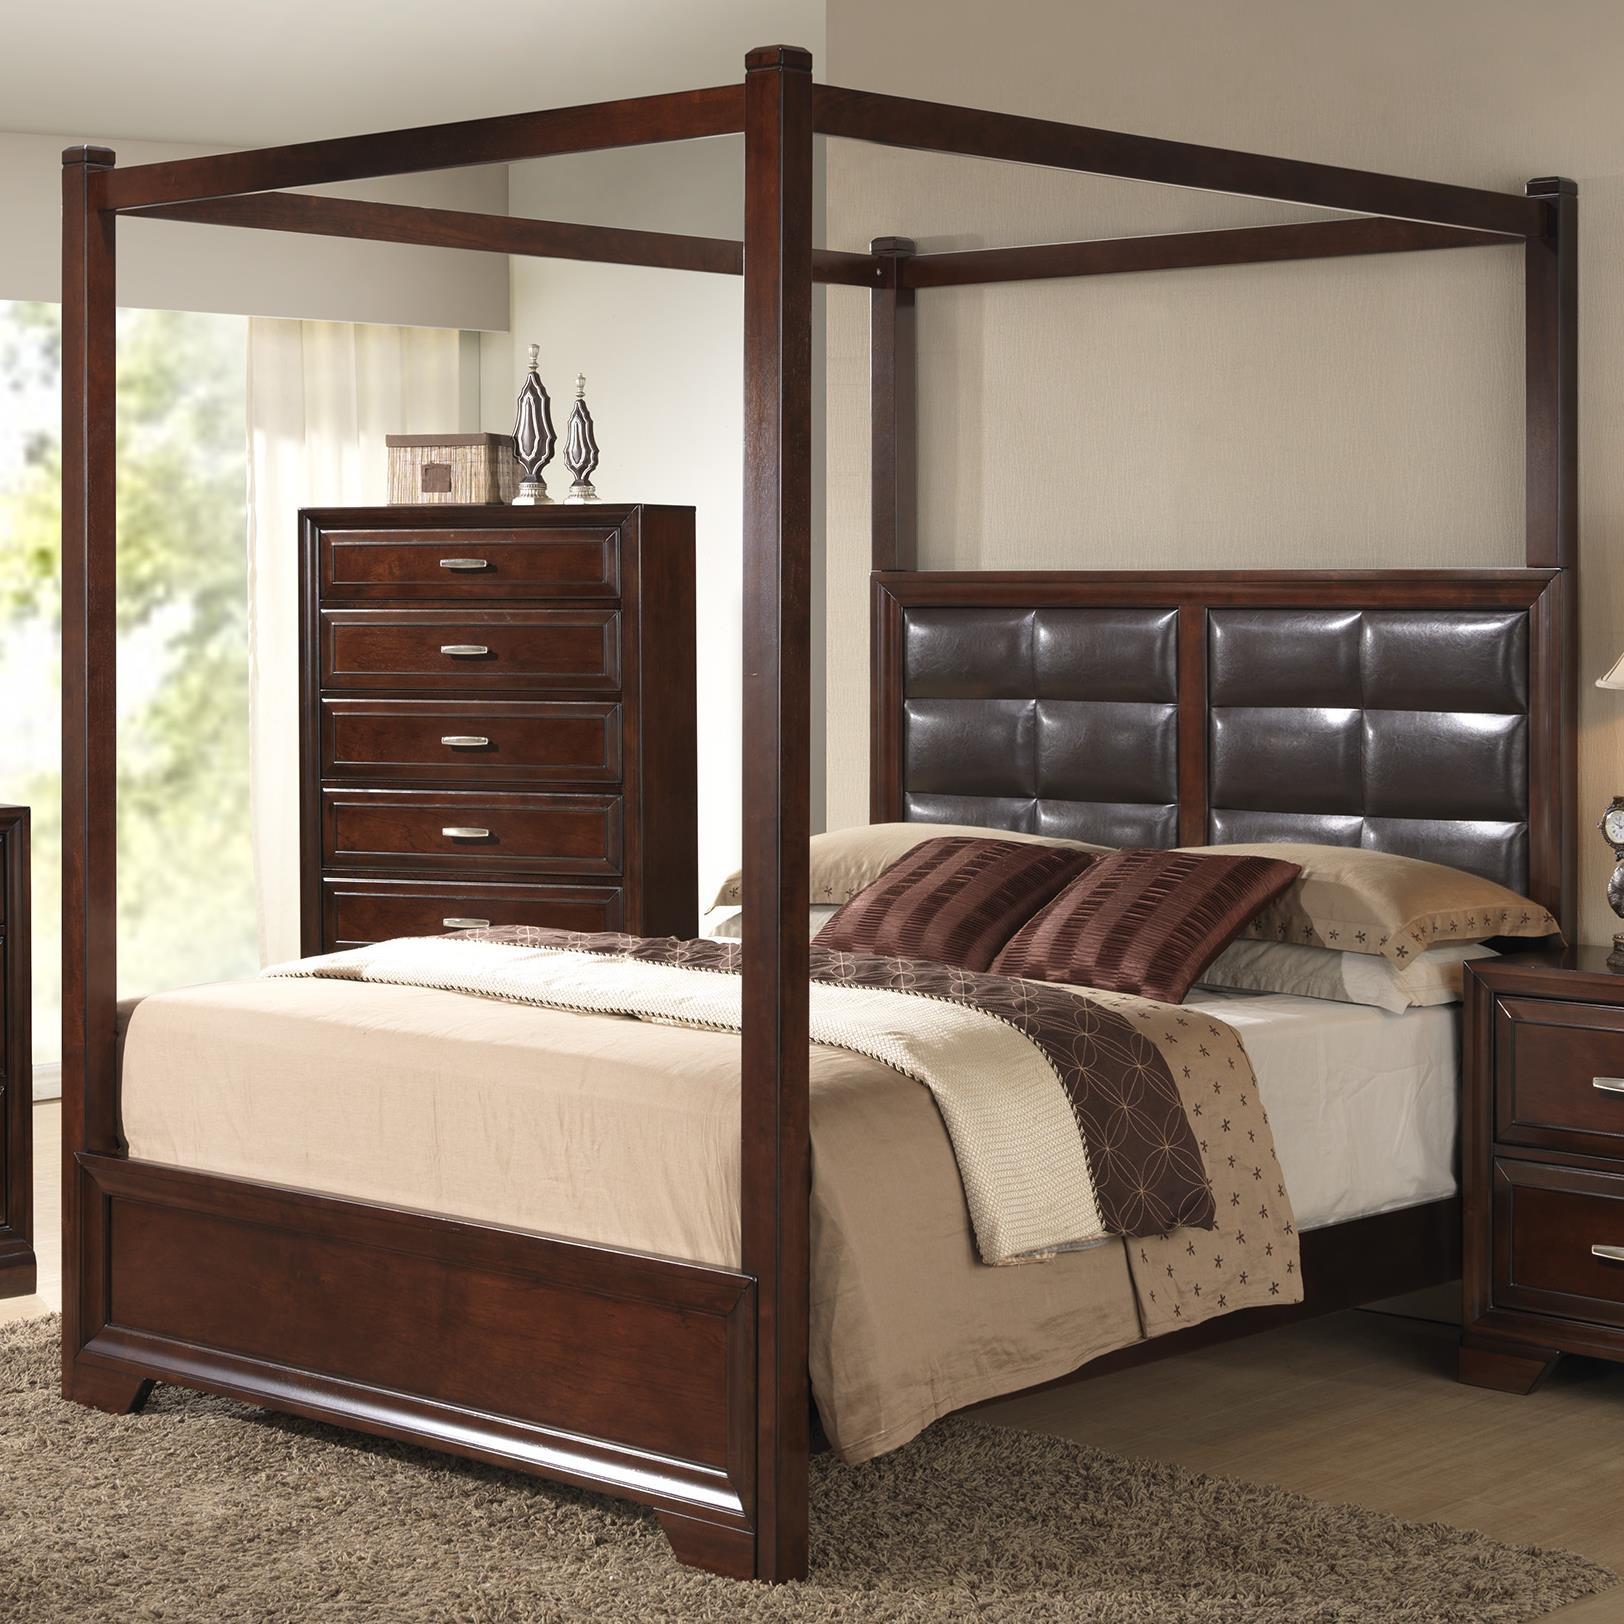 Crown Mark Jacob King Canopy Bed - Item Number: B6540-K-HB+K-FB+KQ-POST+KQ-RAIL